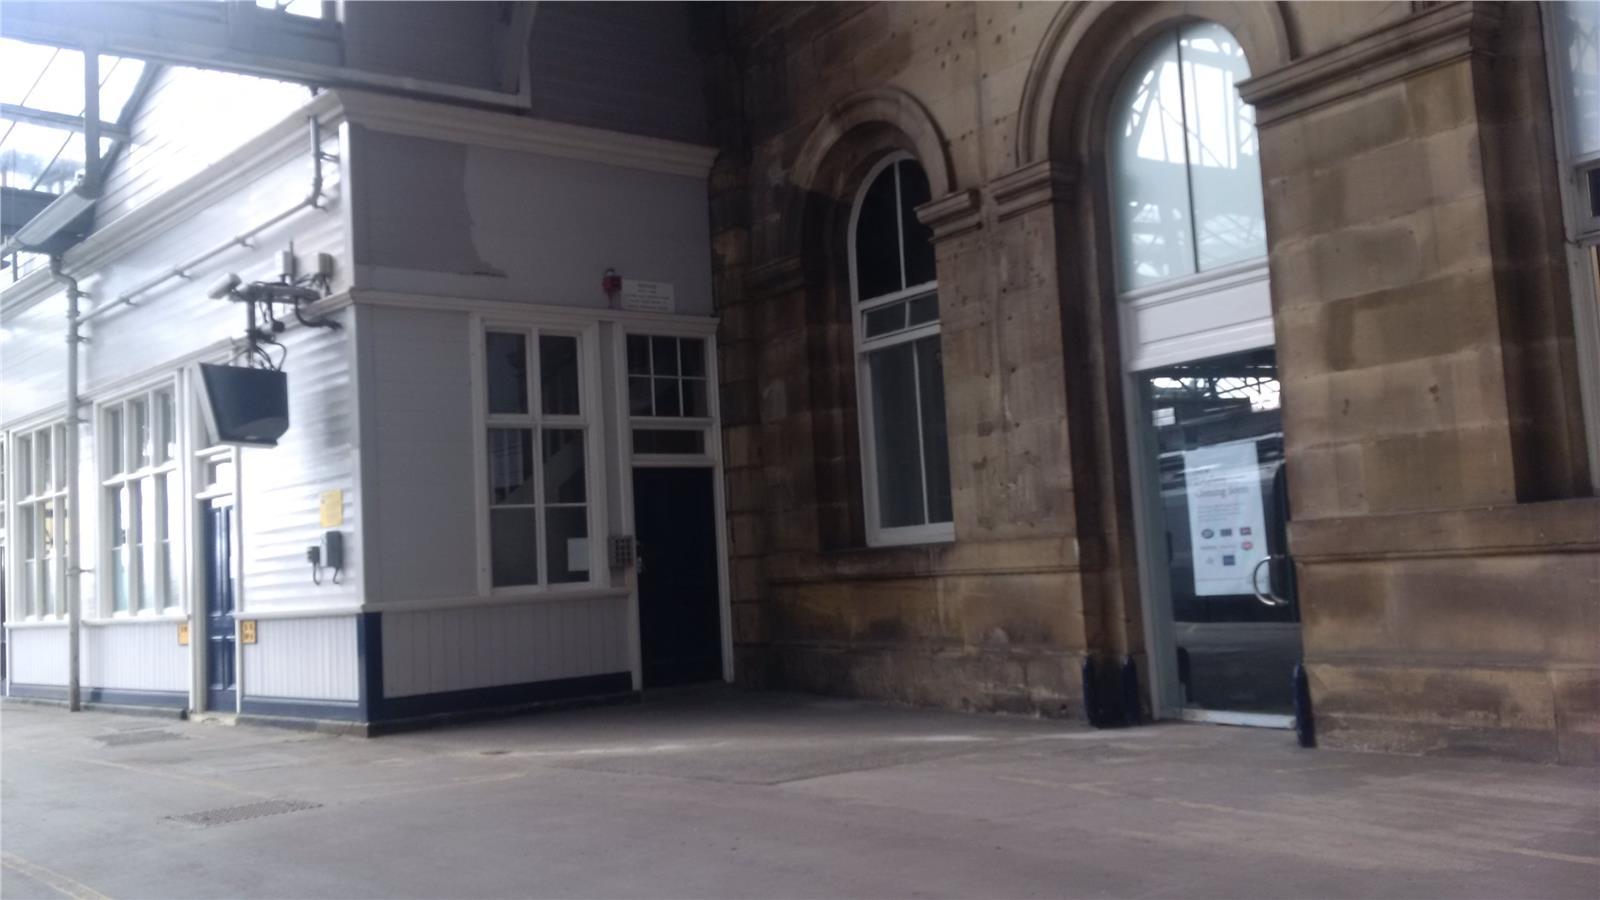 Unit 13, Newcastle Central Railway Station, Neville Street, Newcastle Upon Tyne